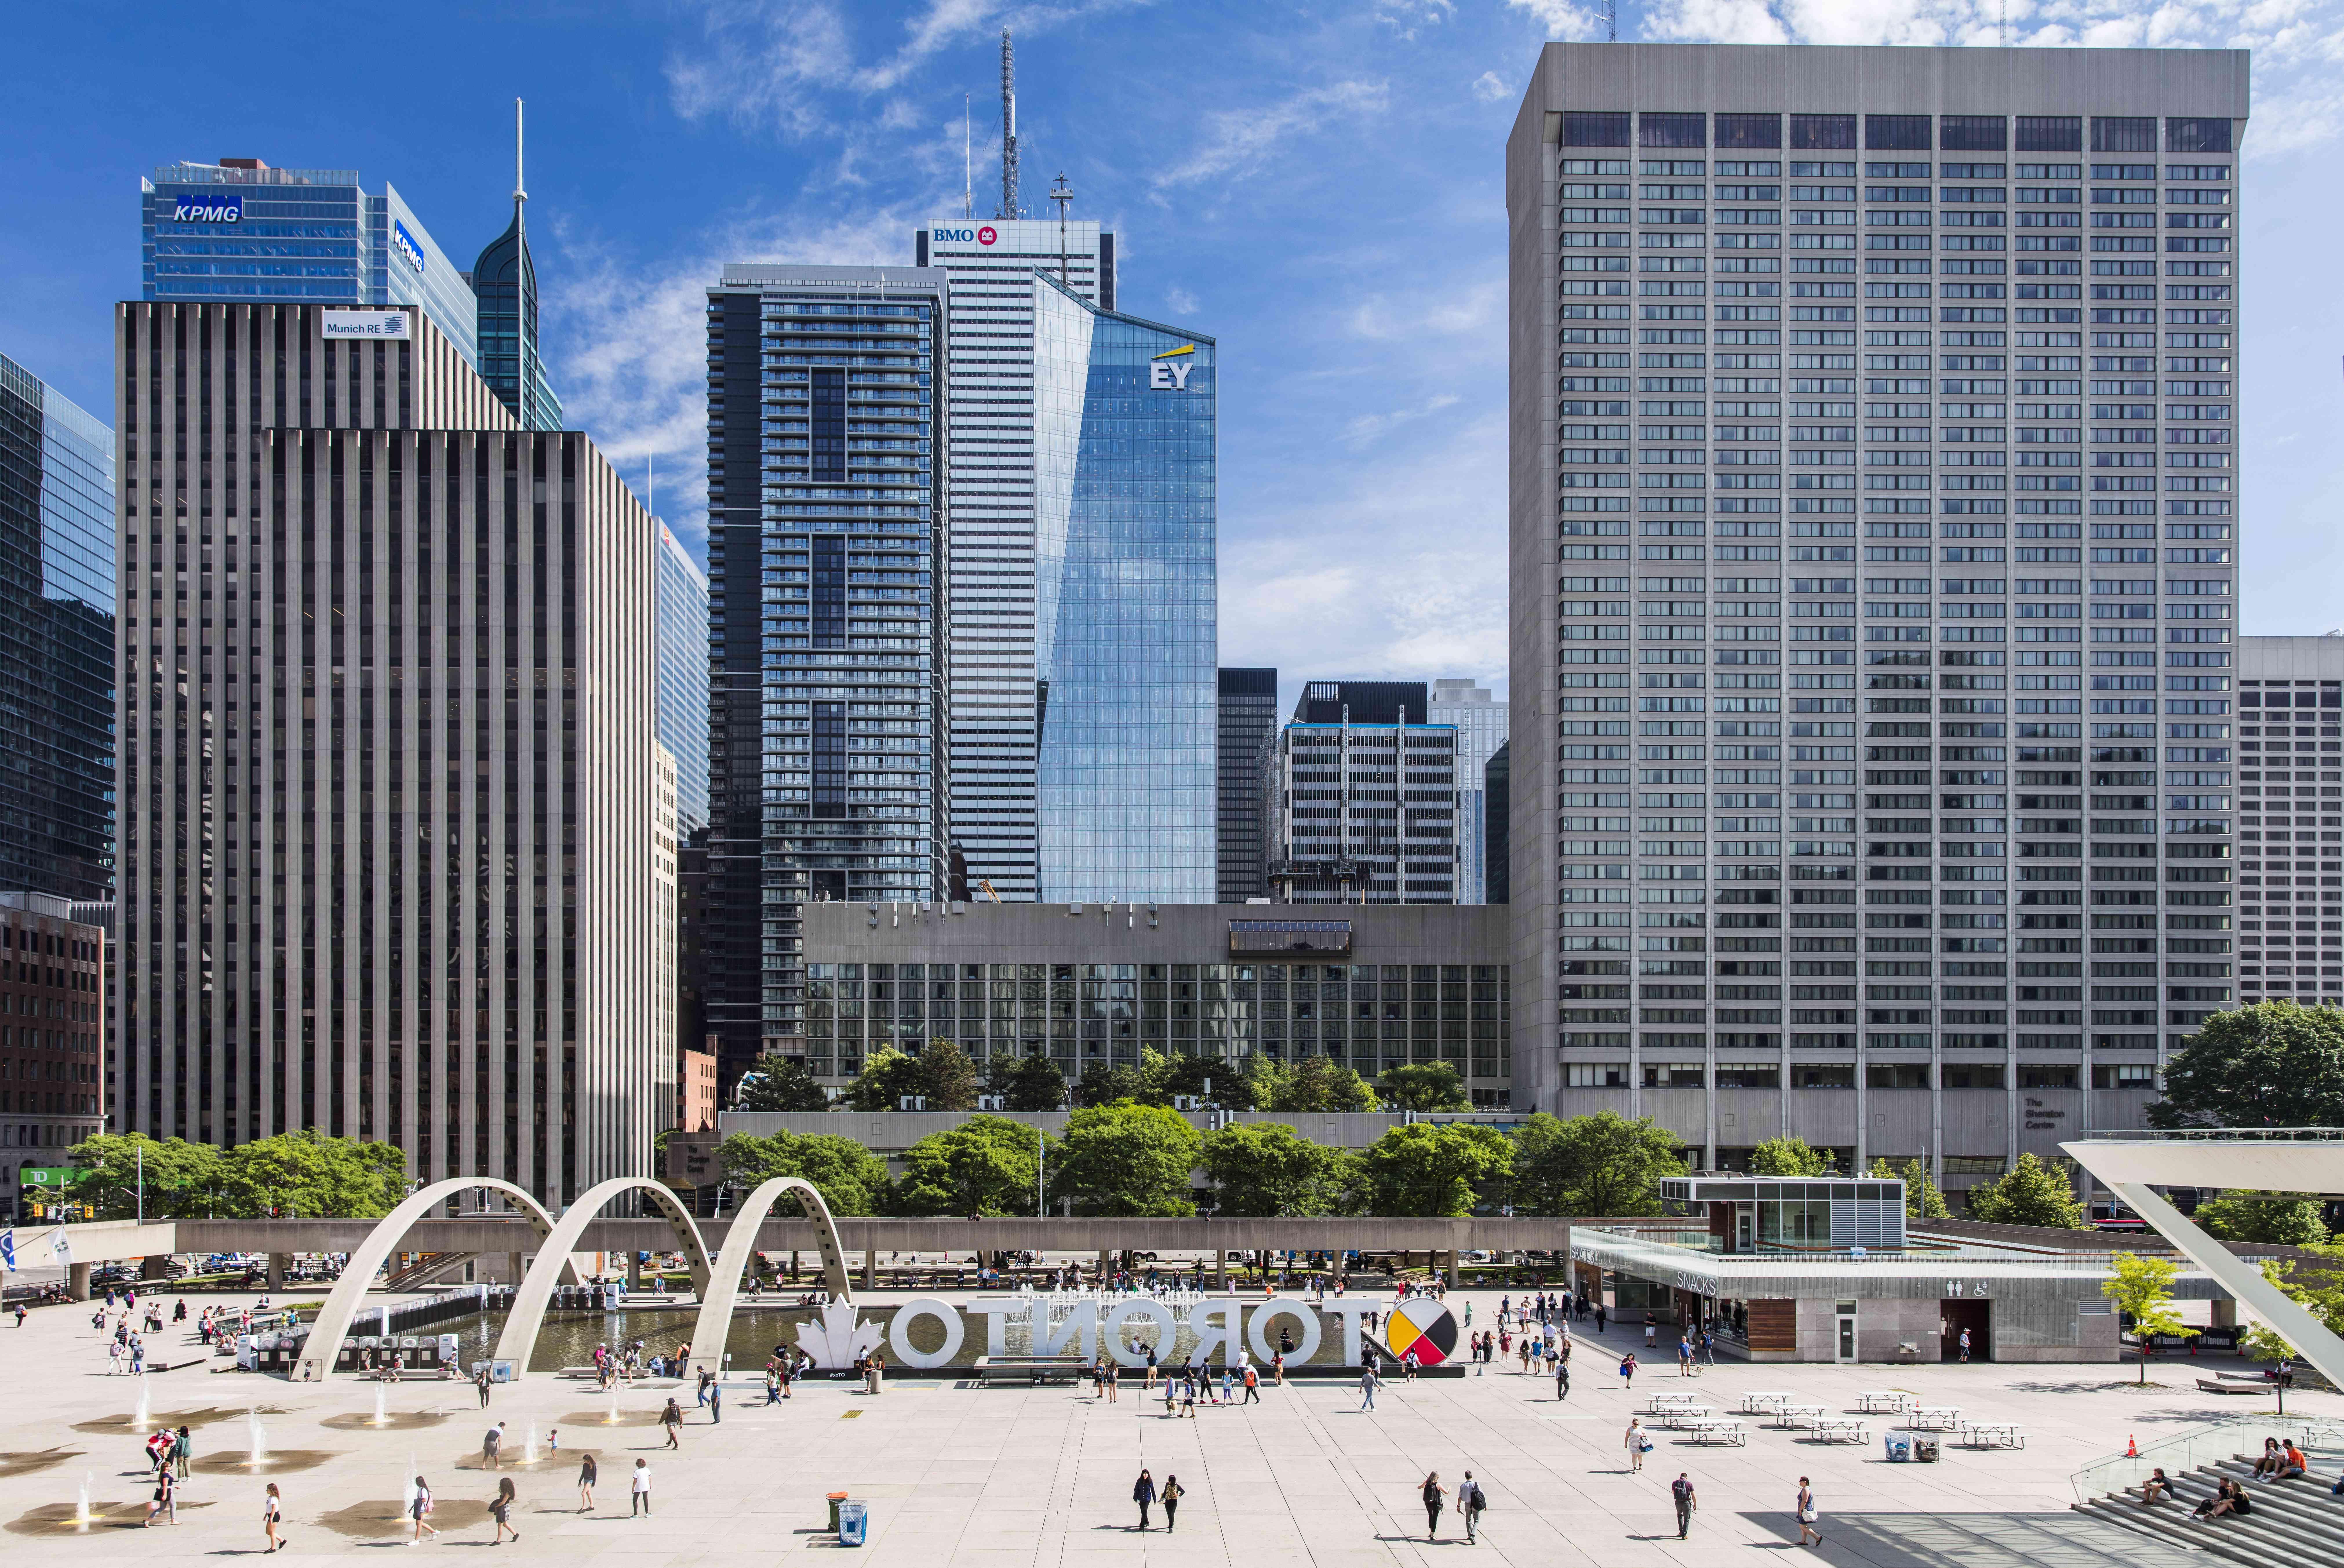 Podium Roof, Toronto